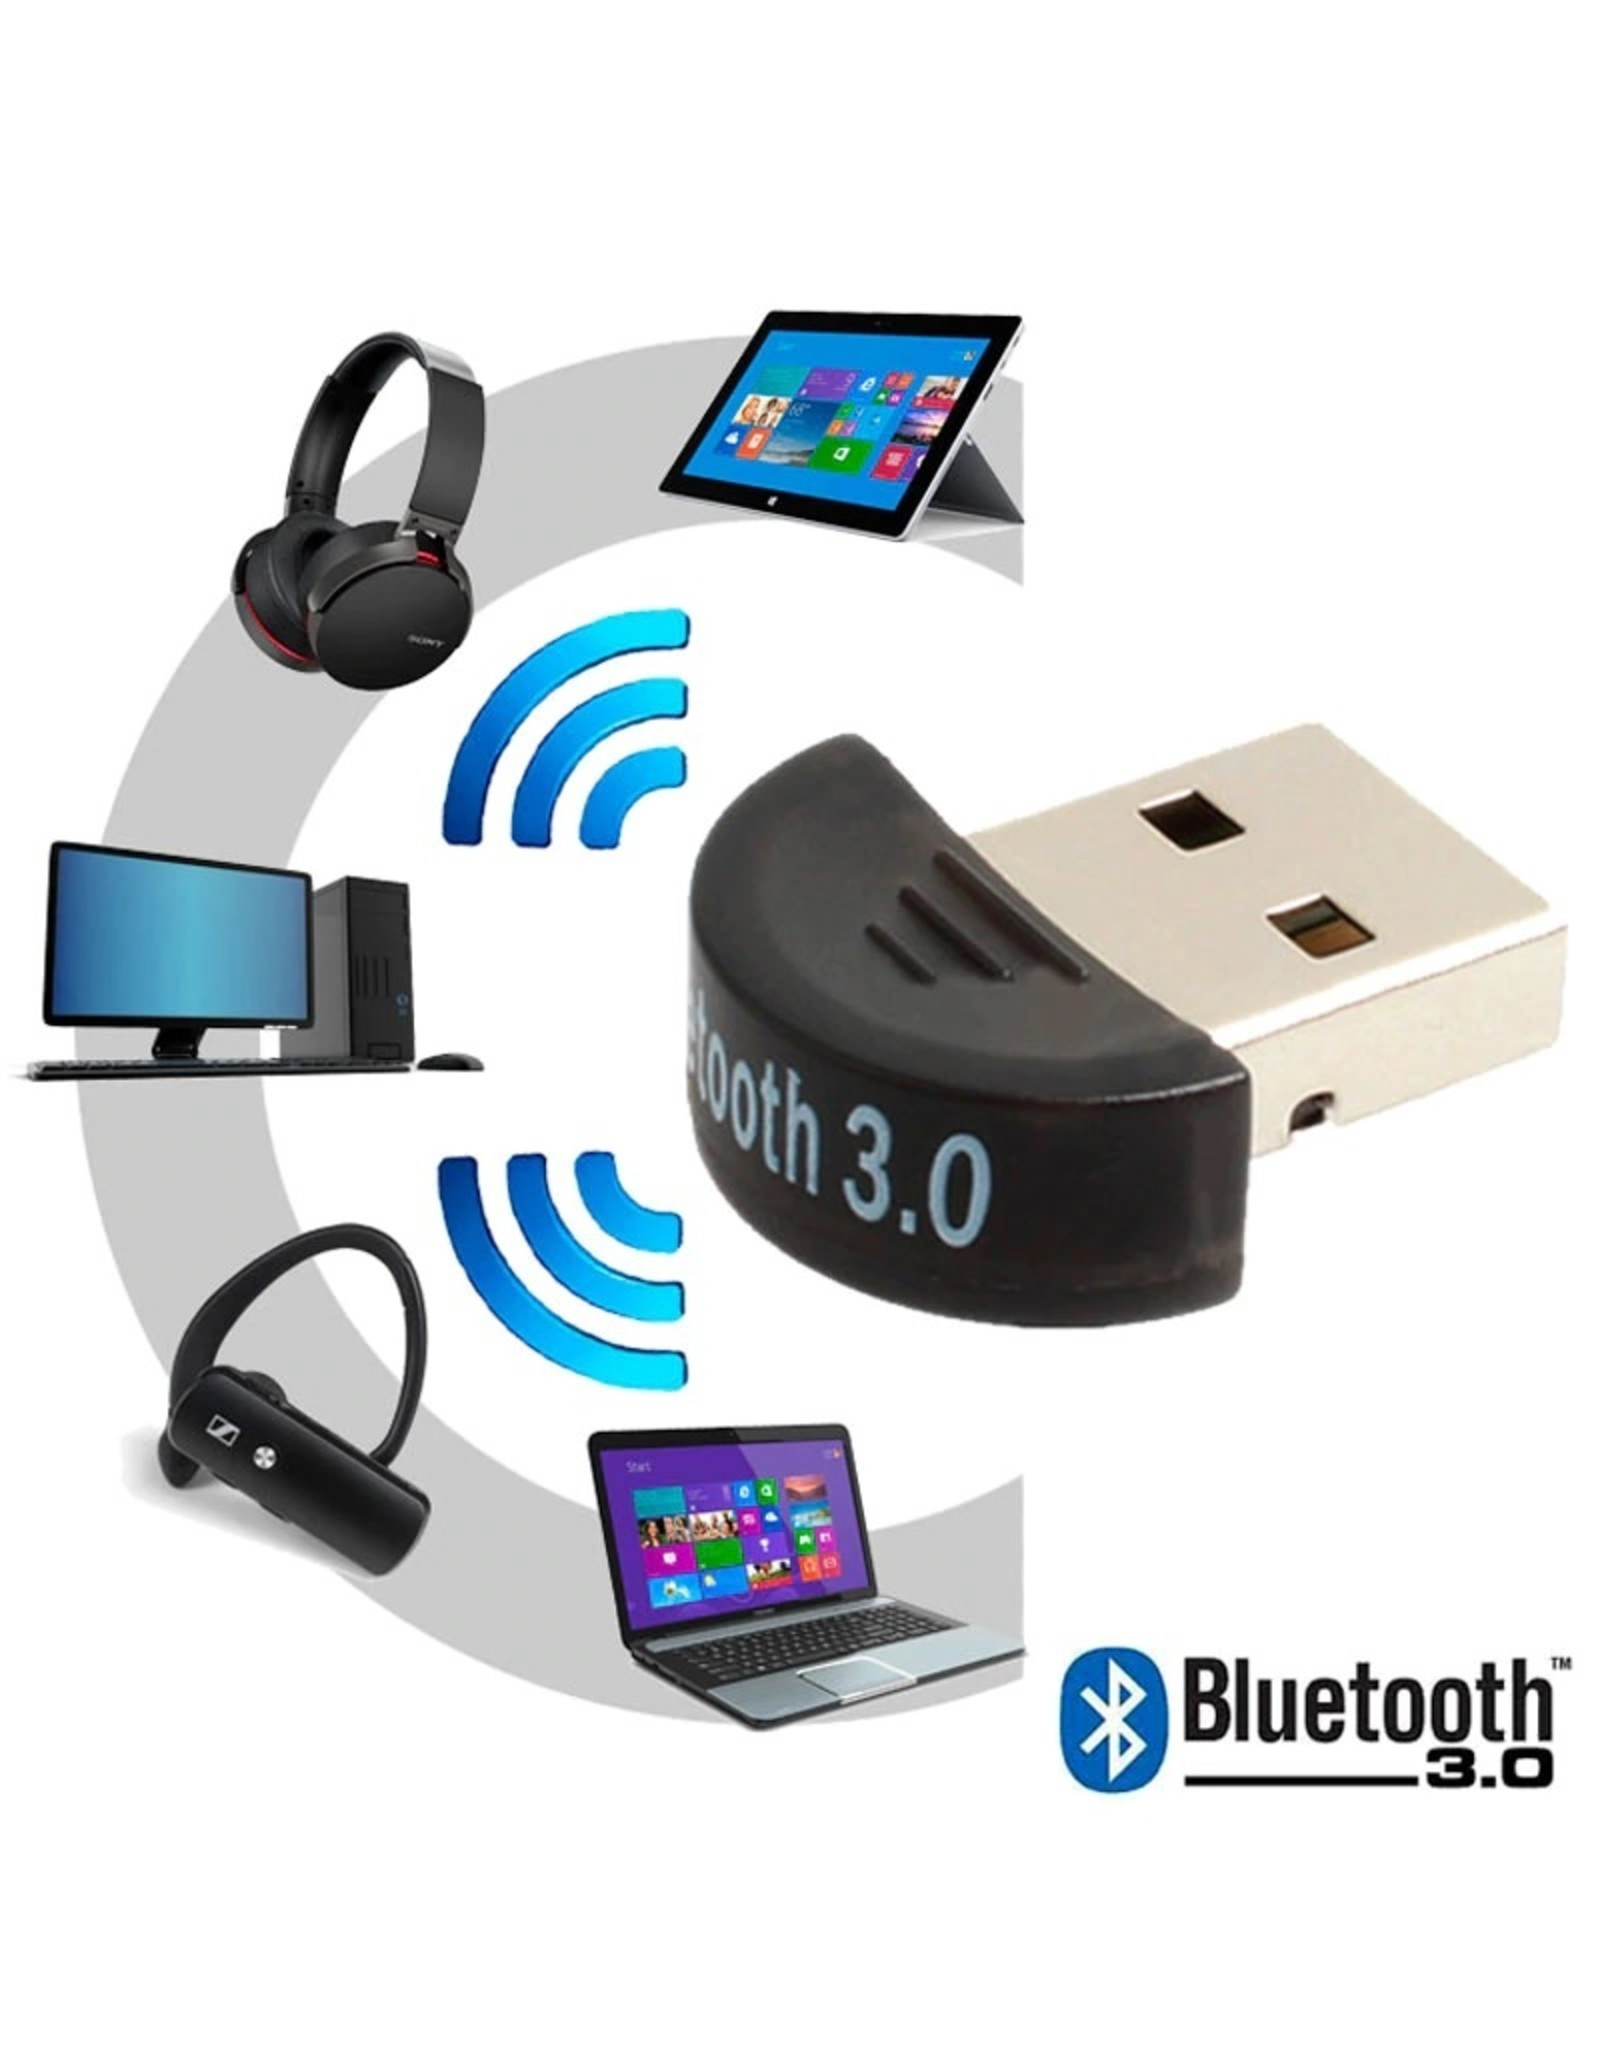 Bluetooth CSR 3.0 Dongle - Mini Bluetooth 3.0 USB Adapter – Dongle - Bluetooth adapter - draadloze dongle - verbind meerdere bluetooth apparaten